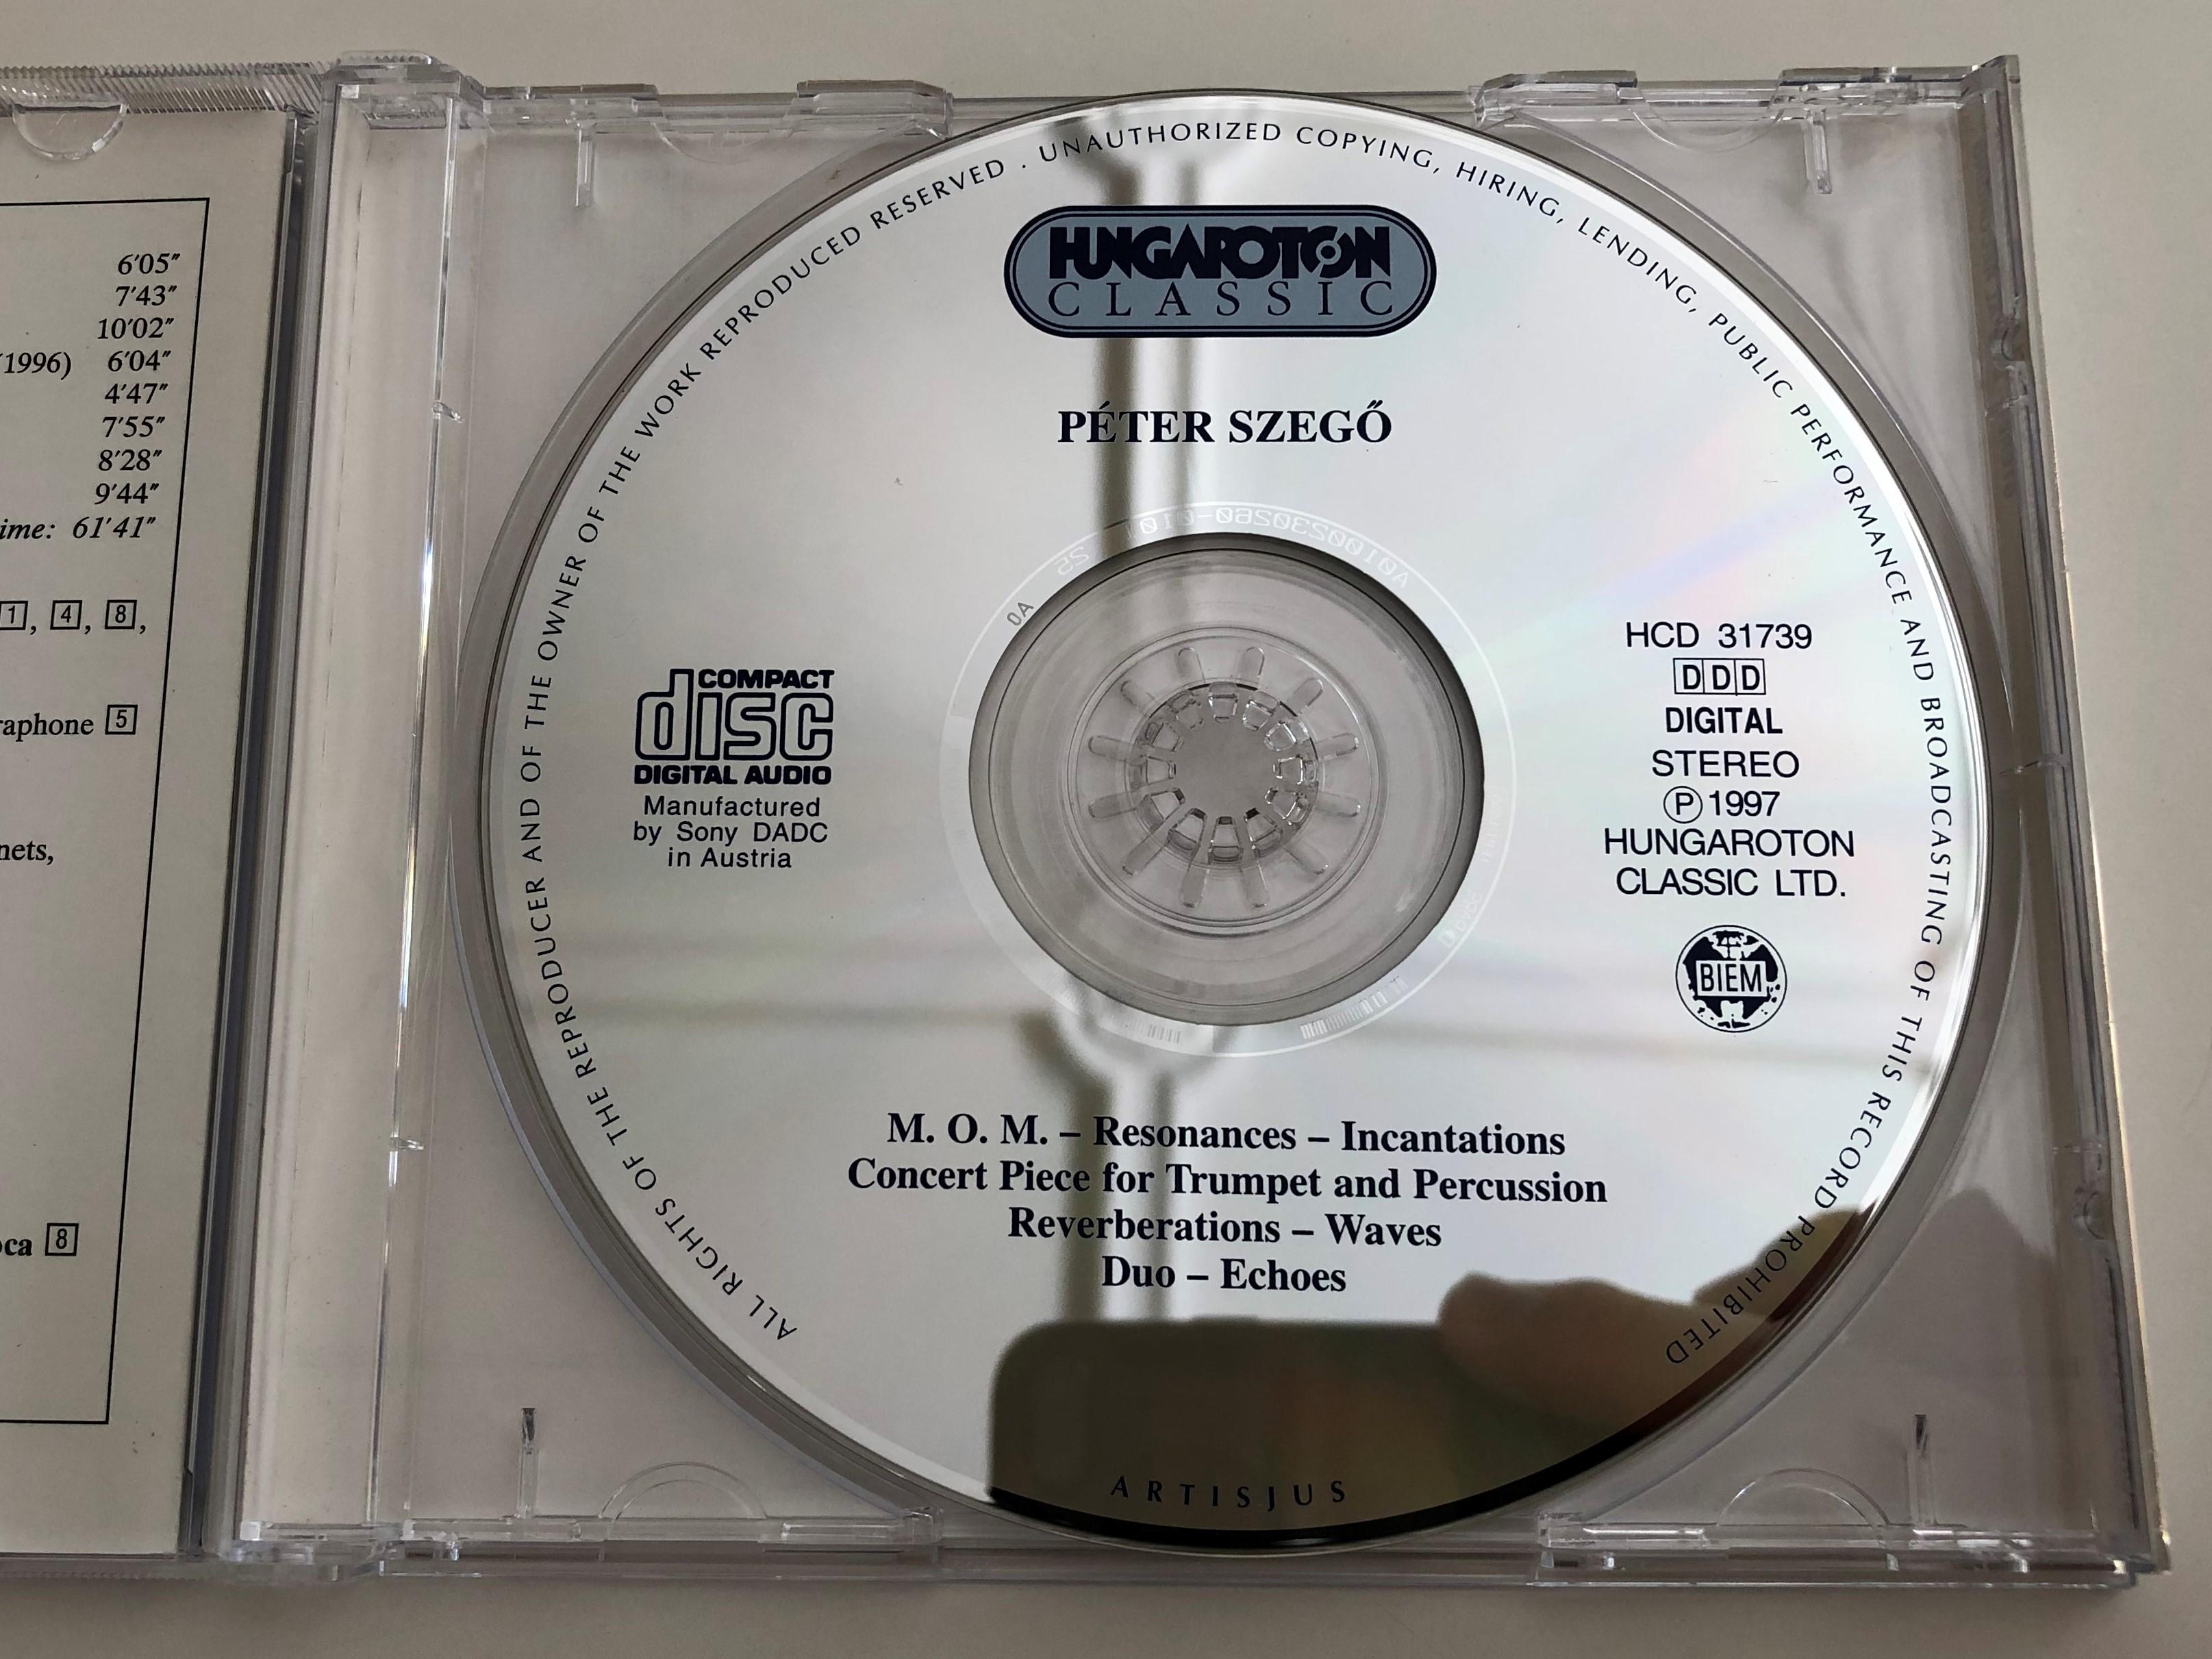 p-ter-szeg-m.o.m-romances-incantations-concert-piece-for-trumpet-and-percussion-reverberations-waves-duo-echoes-hungaroton-classic-audio-cd-1997-hcd-31739-7-.jpg